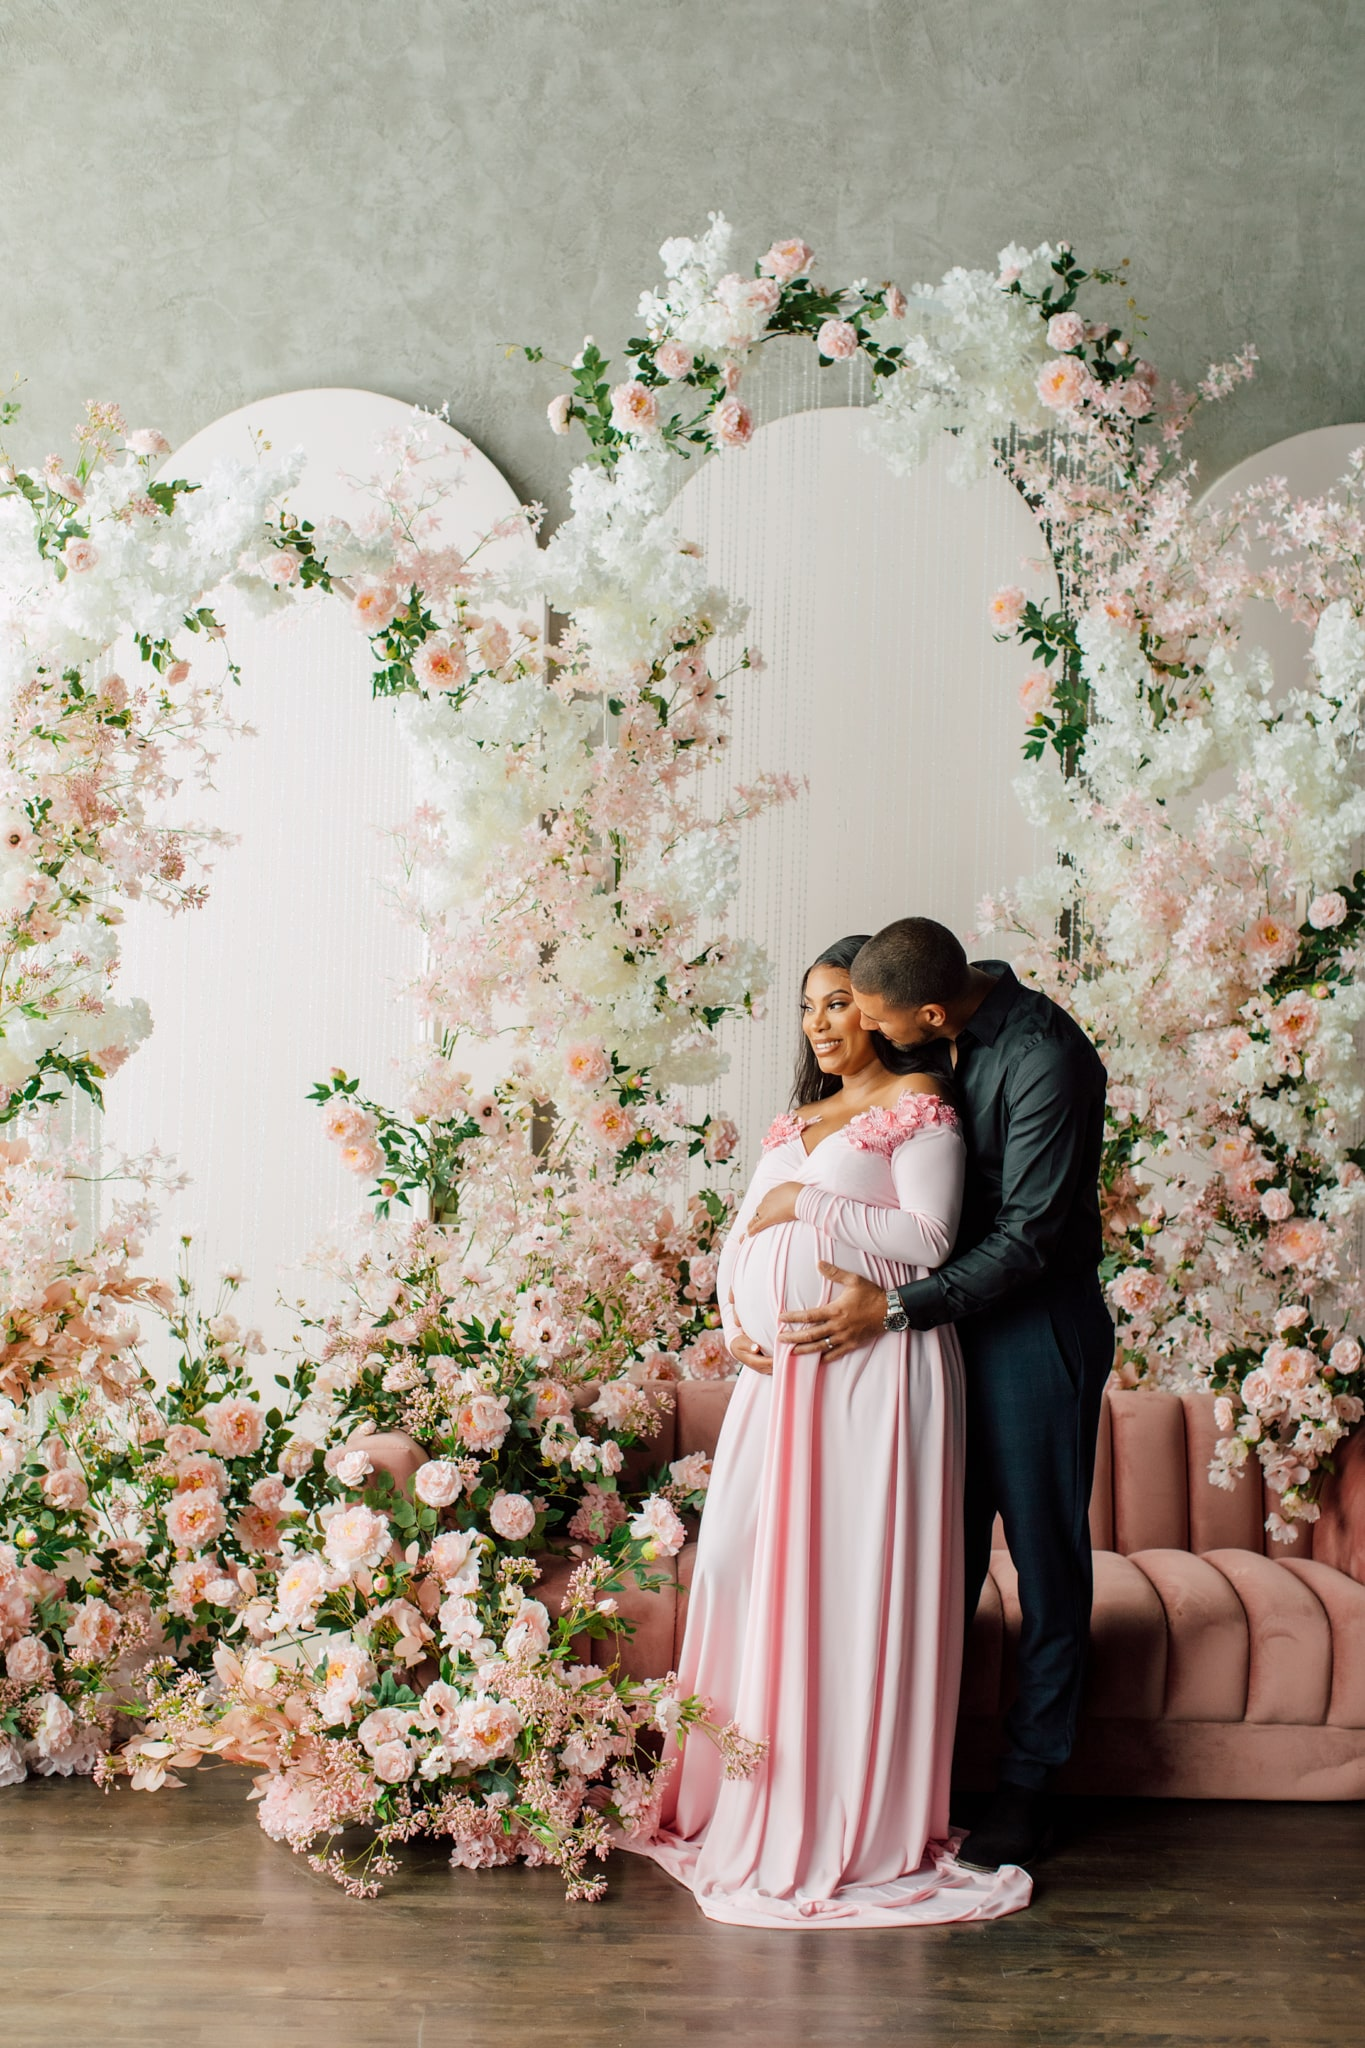 Inspirational Maternity Photoshoot Flowers Time